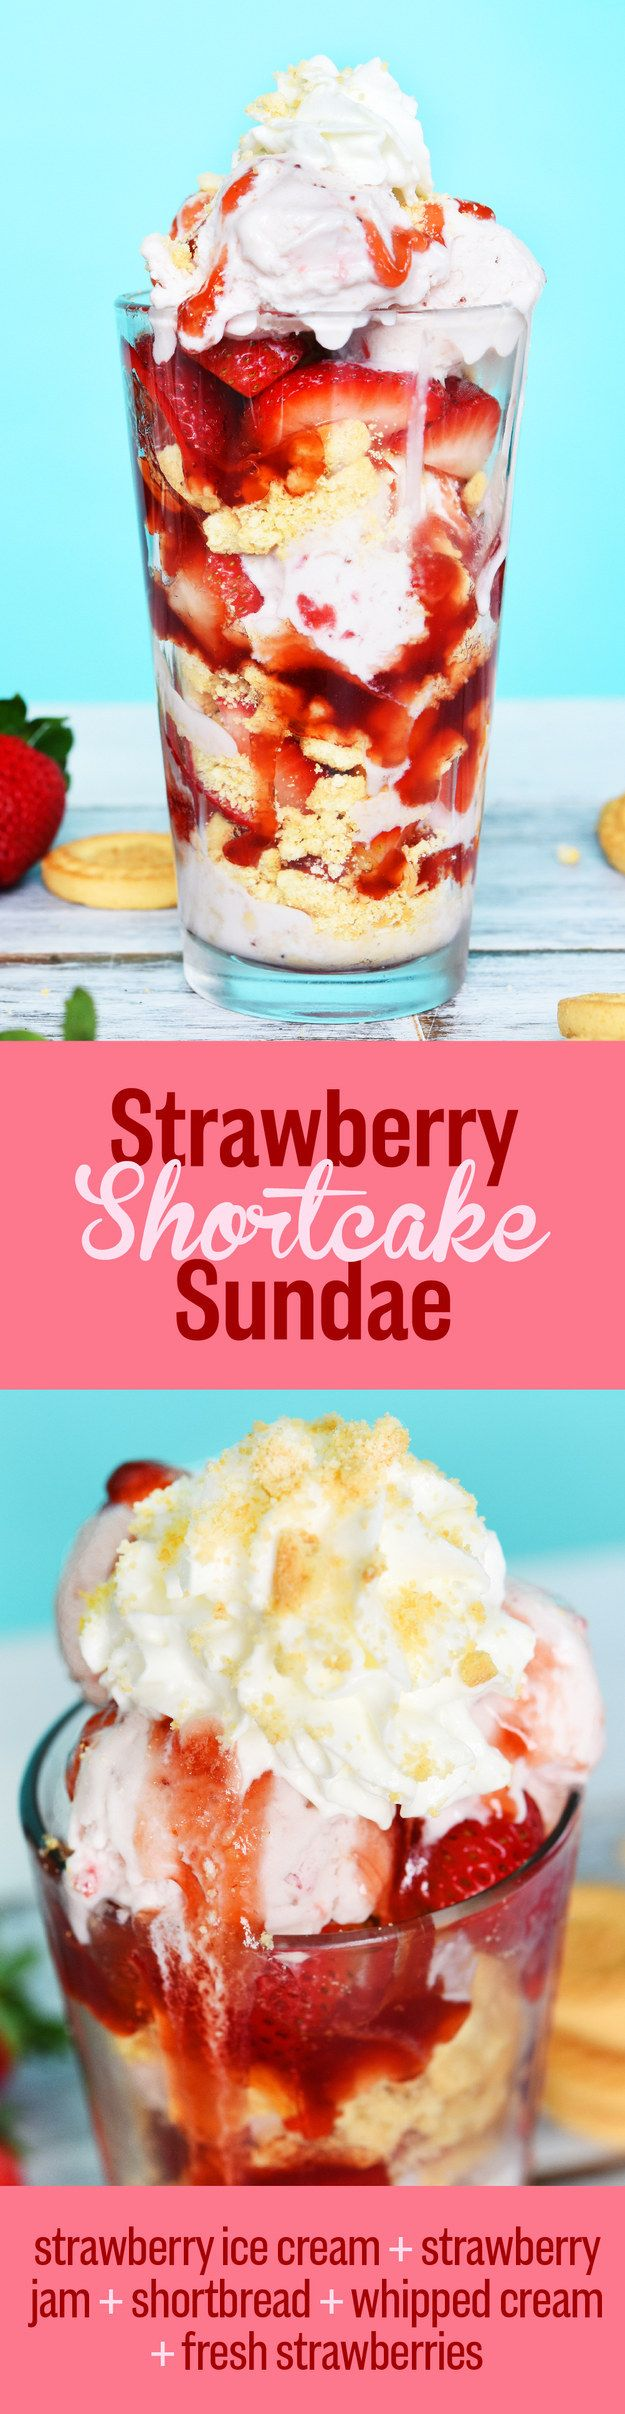 Strawberry Shortcake Sundae | 7 Insanely Delicious Sundaes You Need To Eat Before Summer Is Over